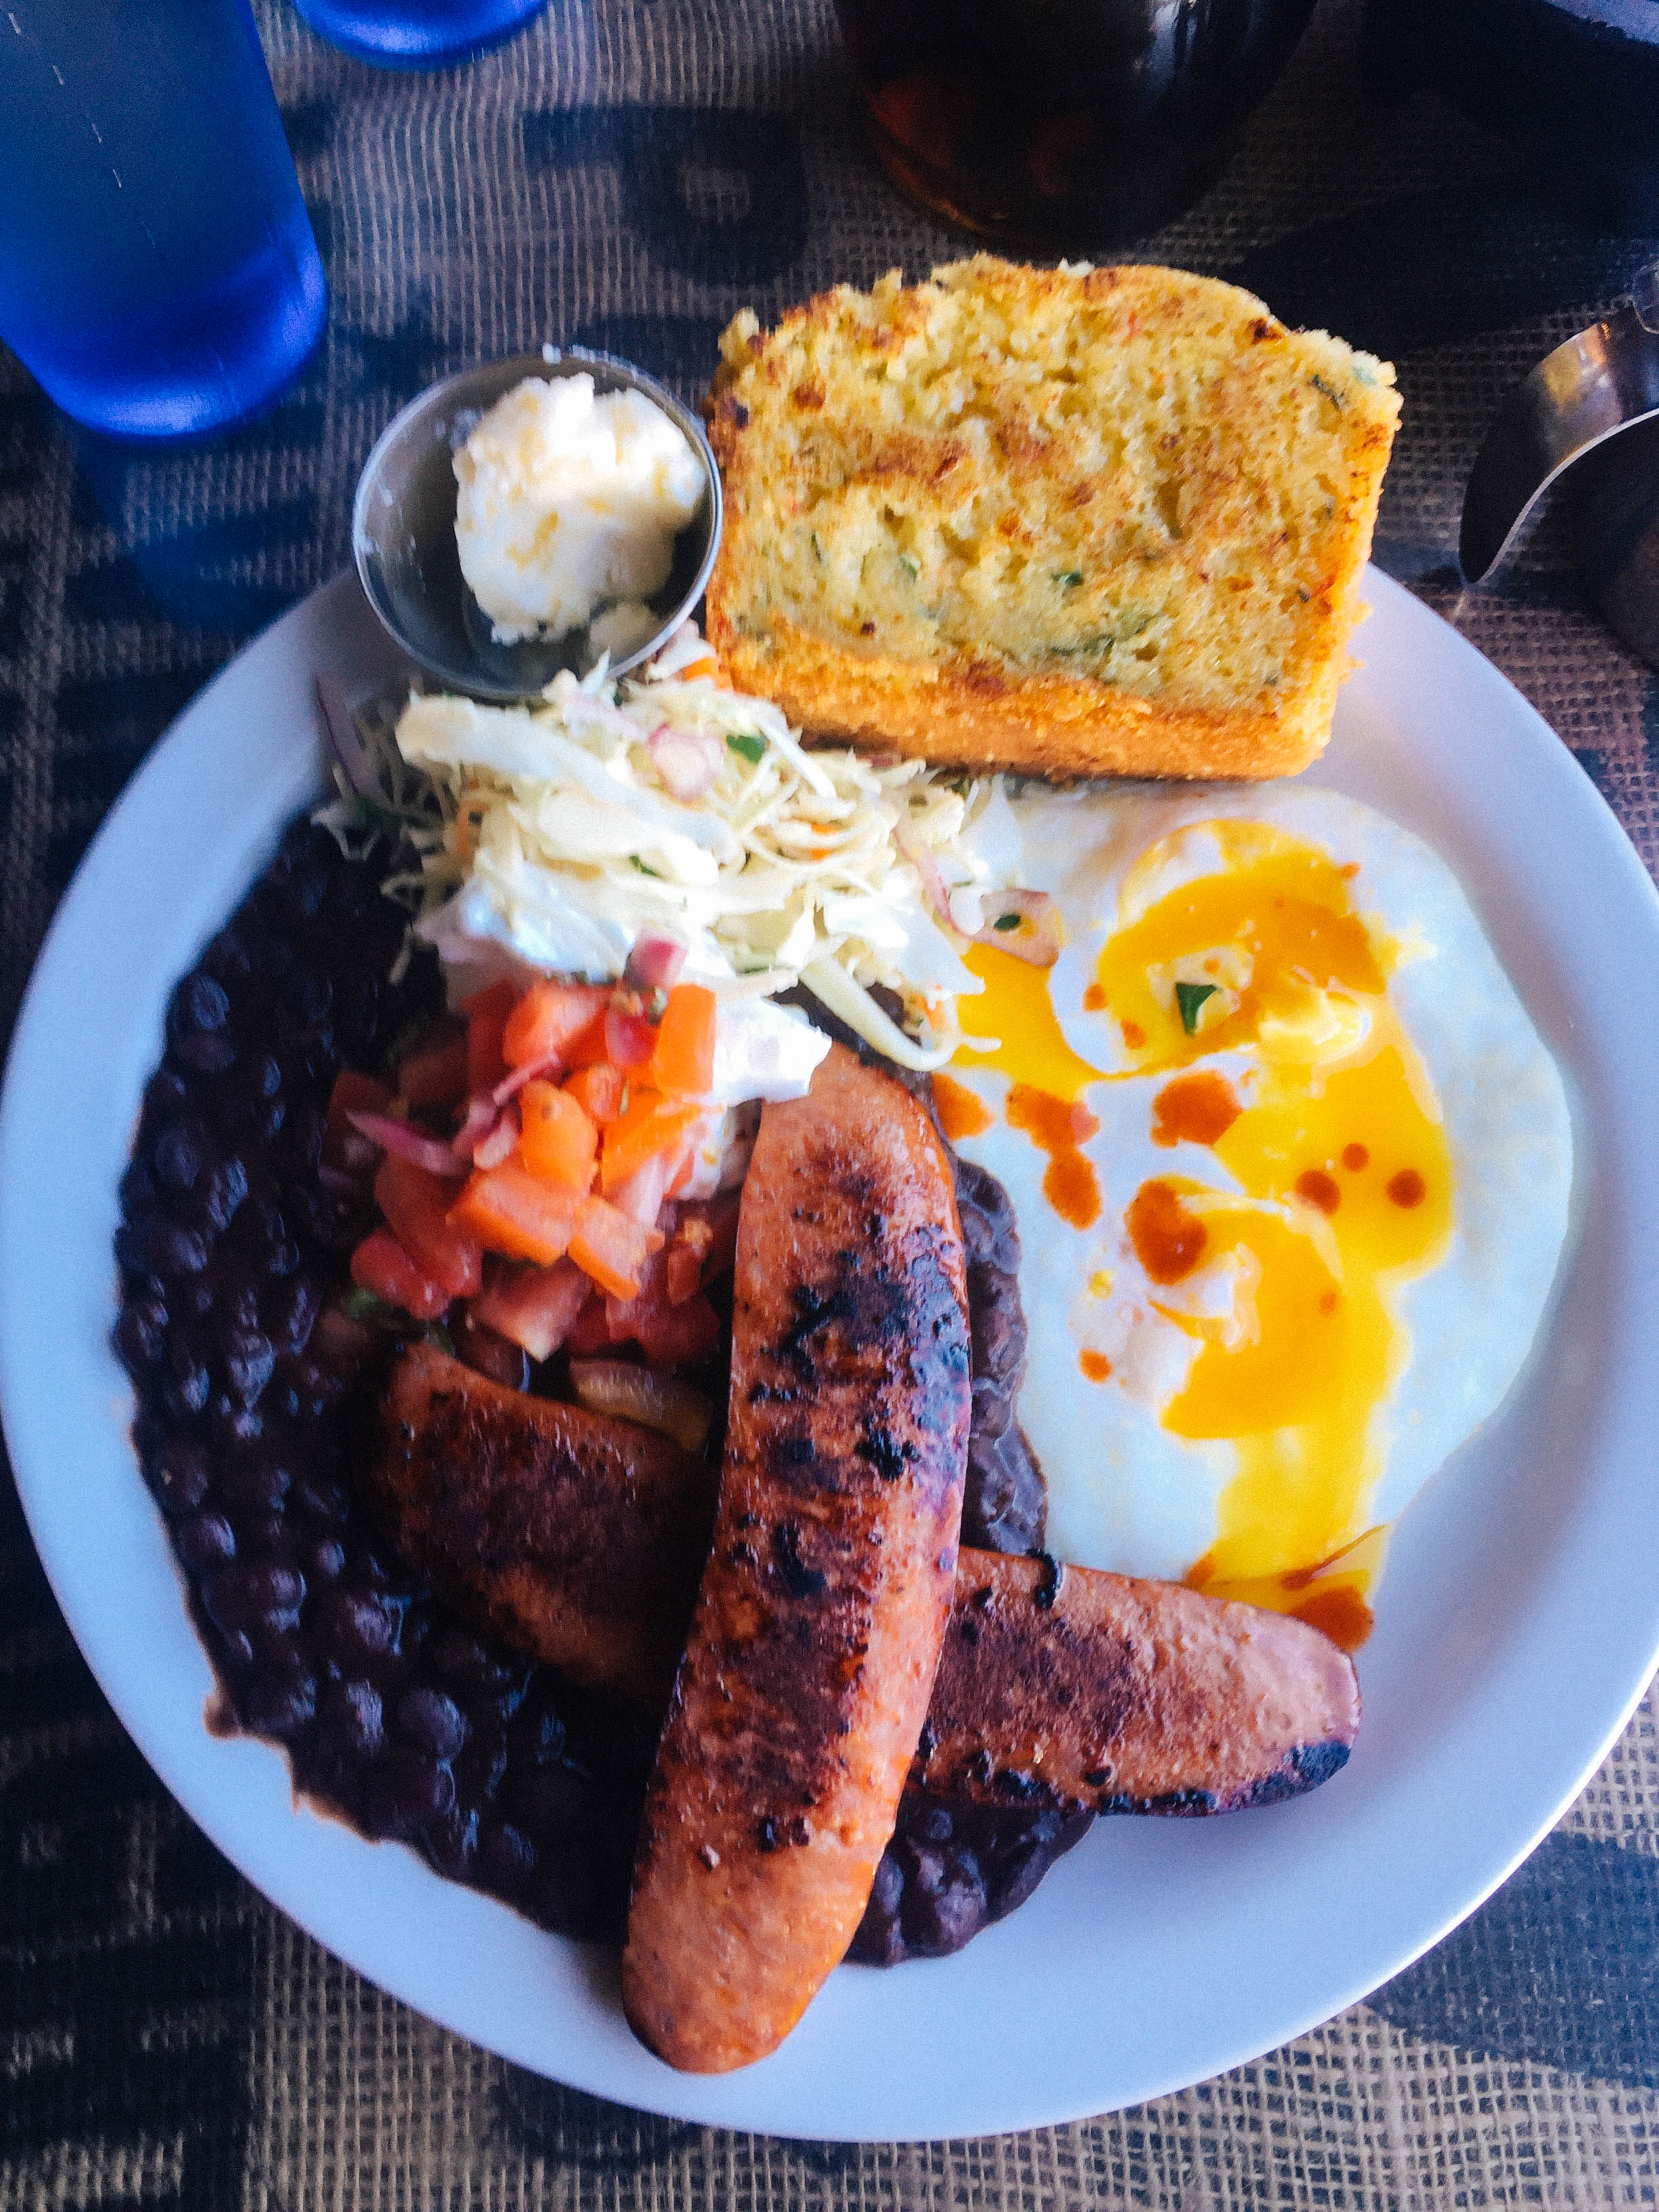 The Zydeco Breakfast at Crossroads Cafe, Joshua Tree, CA